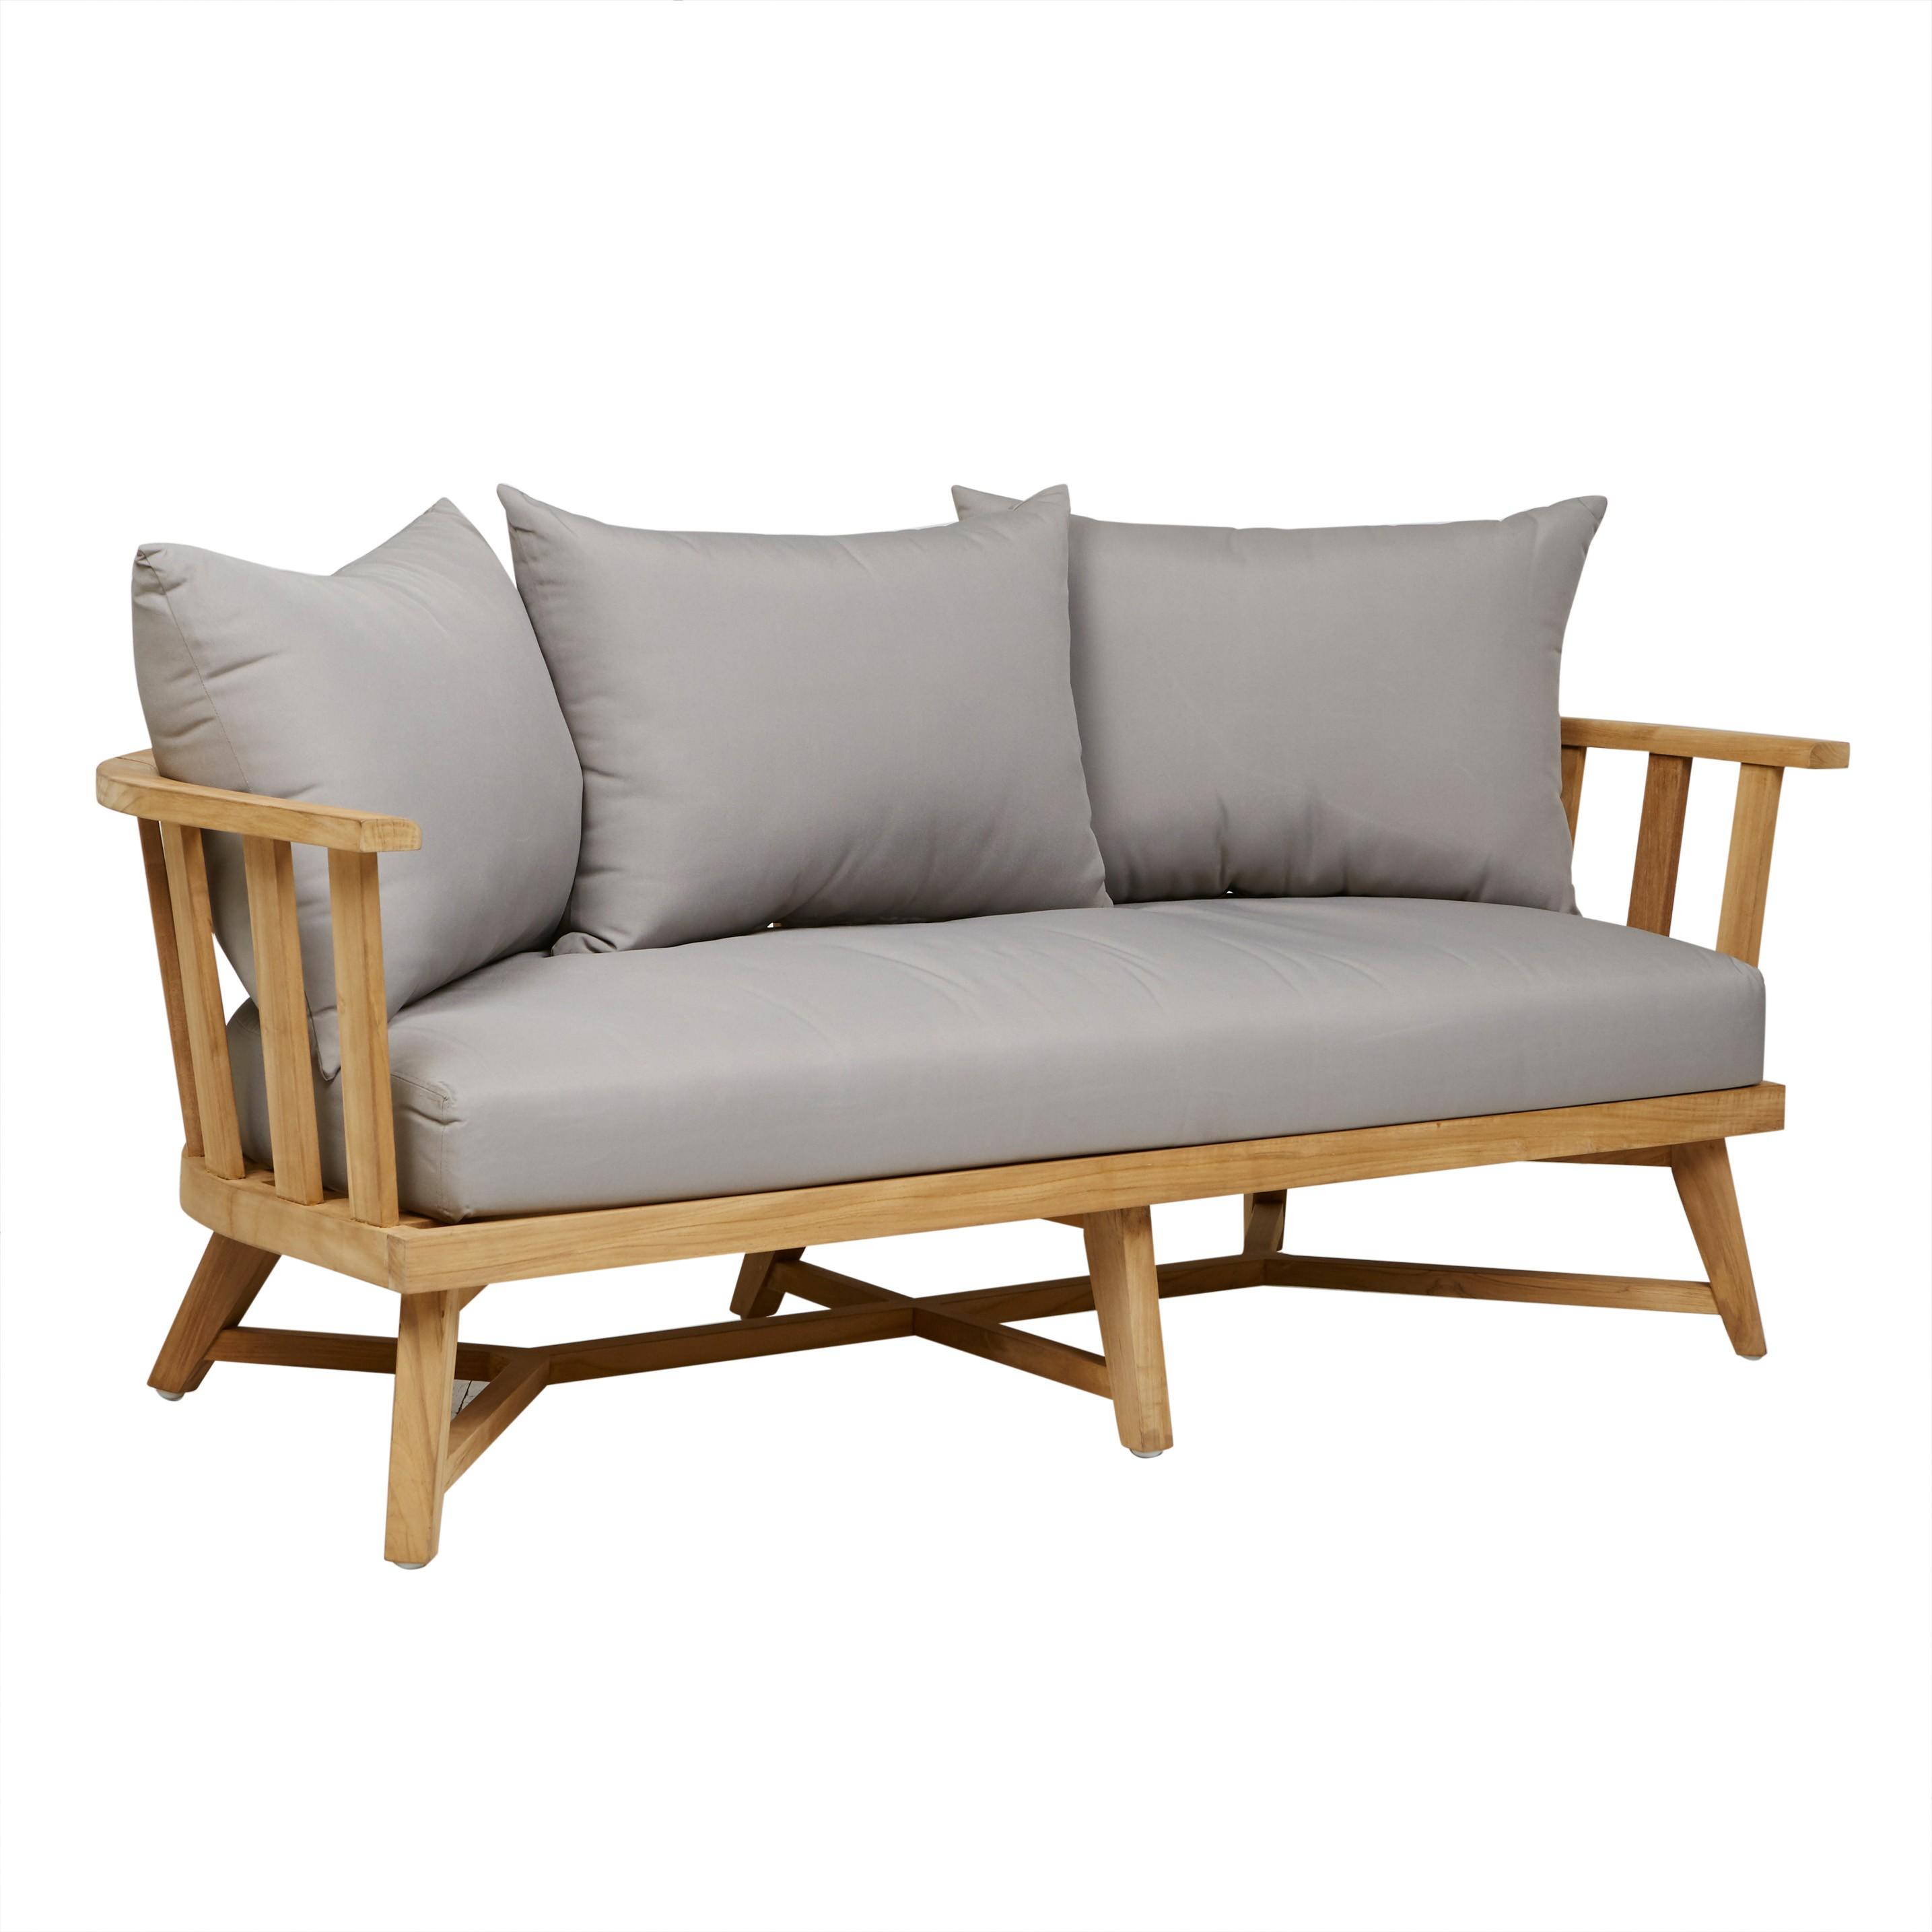 Furniture Hero-Images Sofas sonoma-slat-three-seater-02